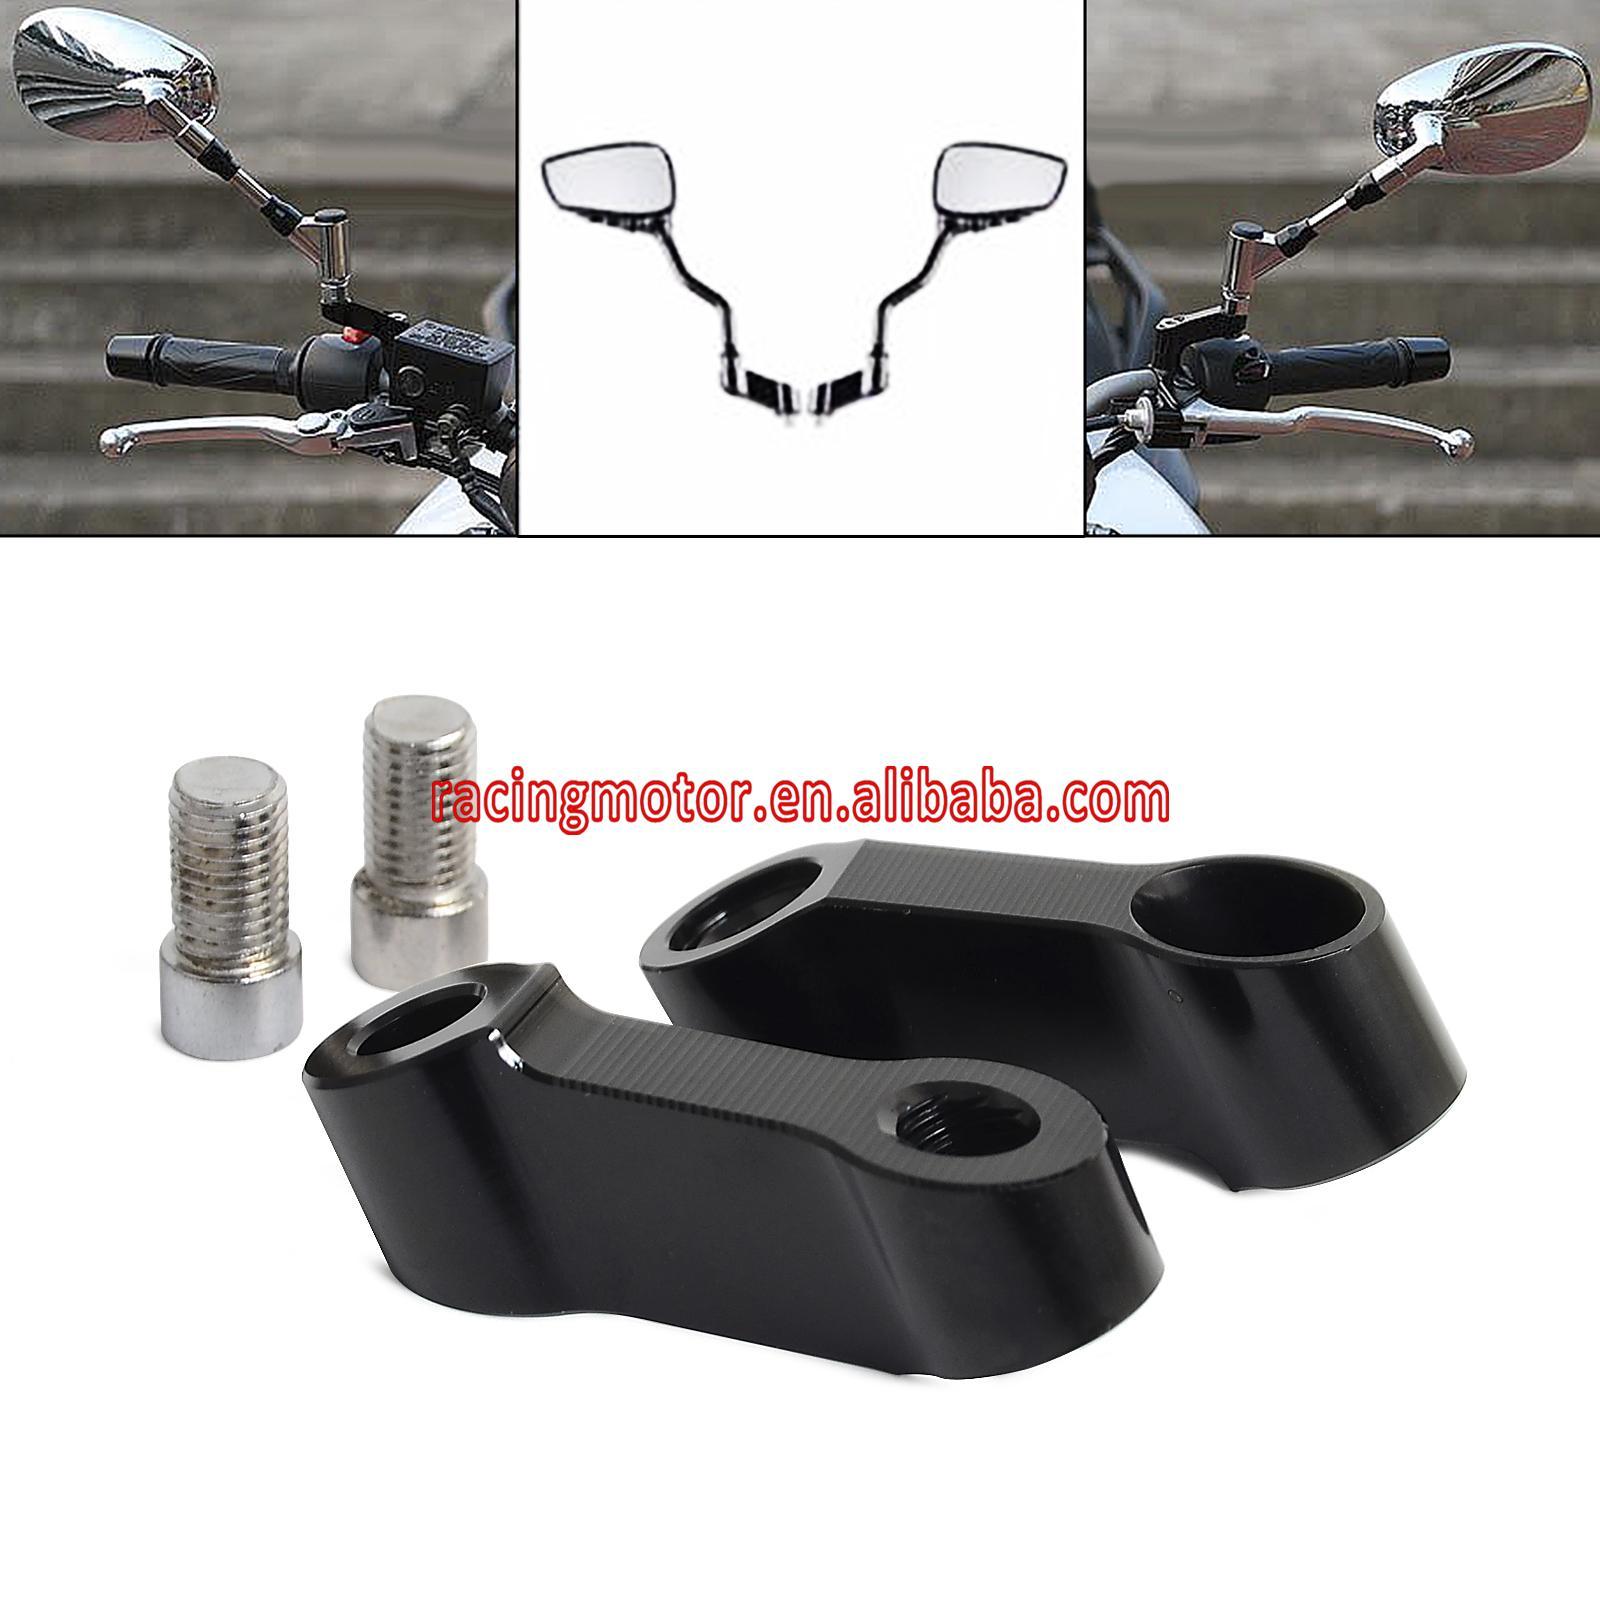 10mm Universal CNC Aluminum Motorcycle Bike Mirror Mount Riser Extender Adapter M10 universal bike bicycle motorcycle helmet mount accessories